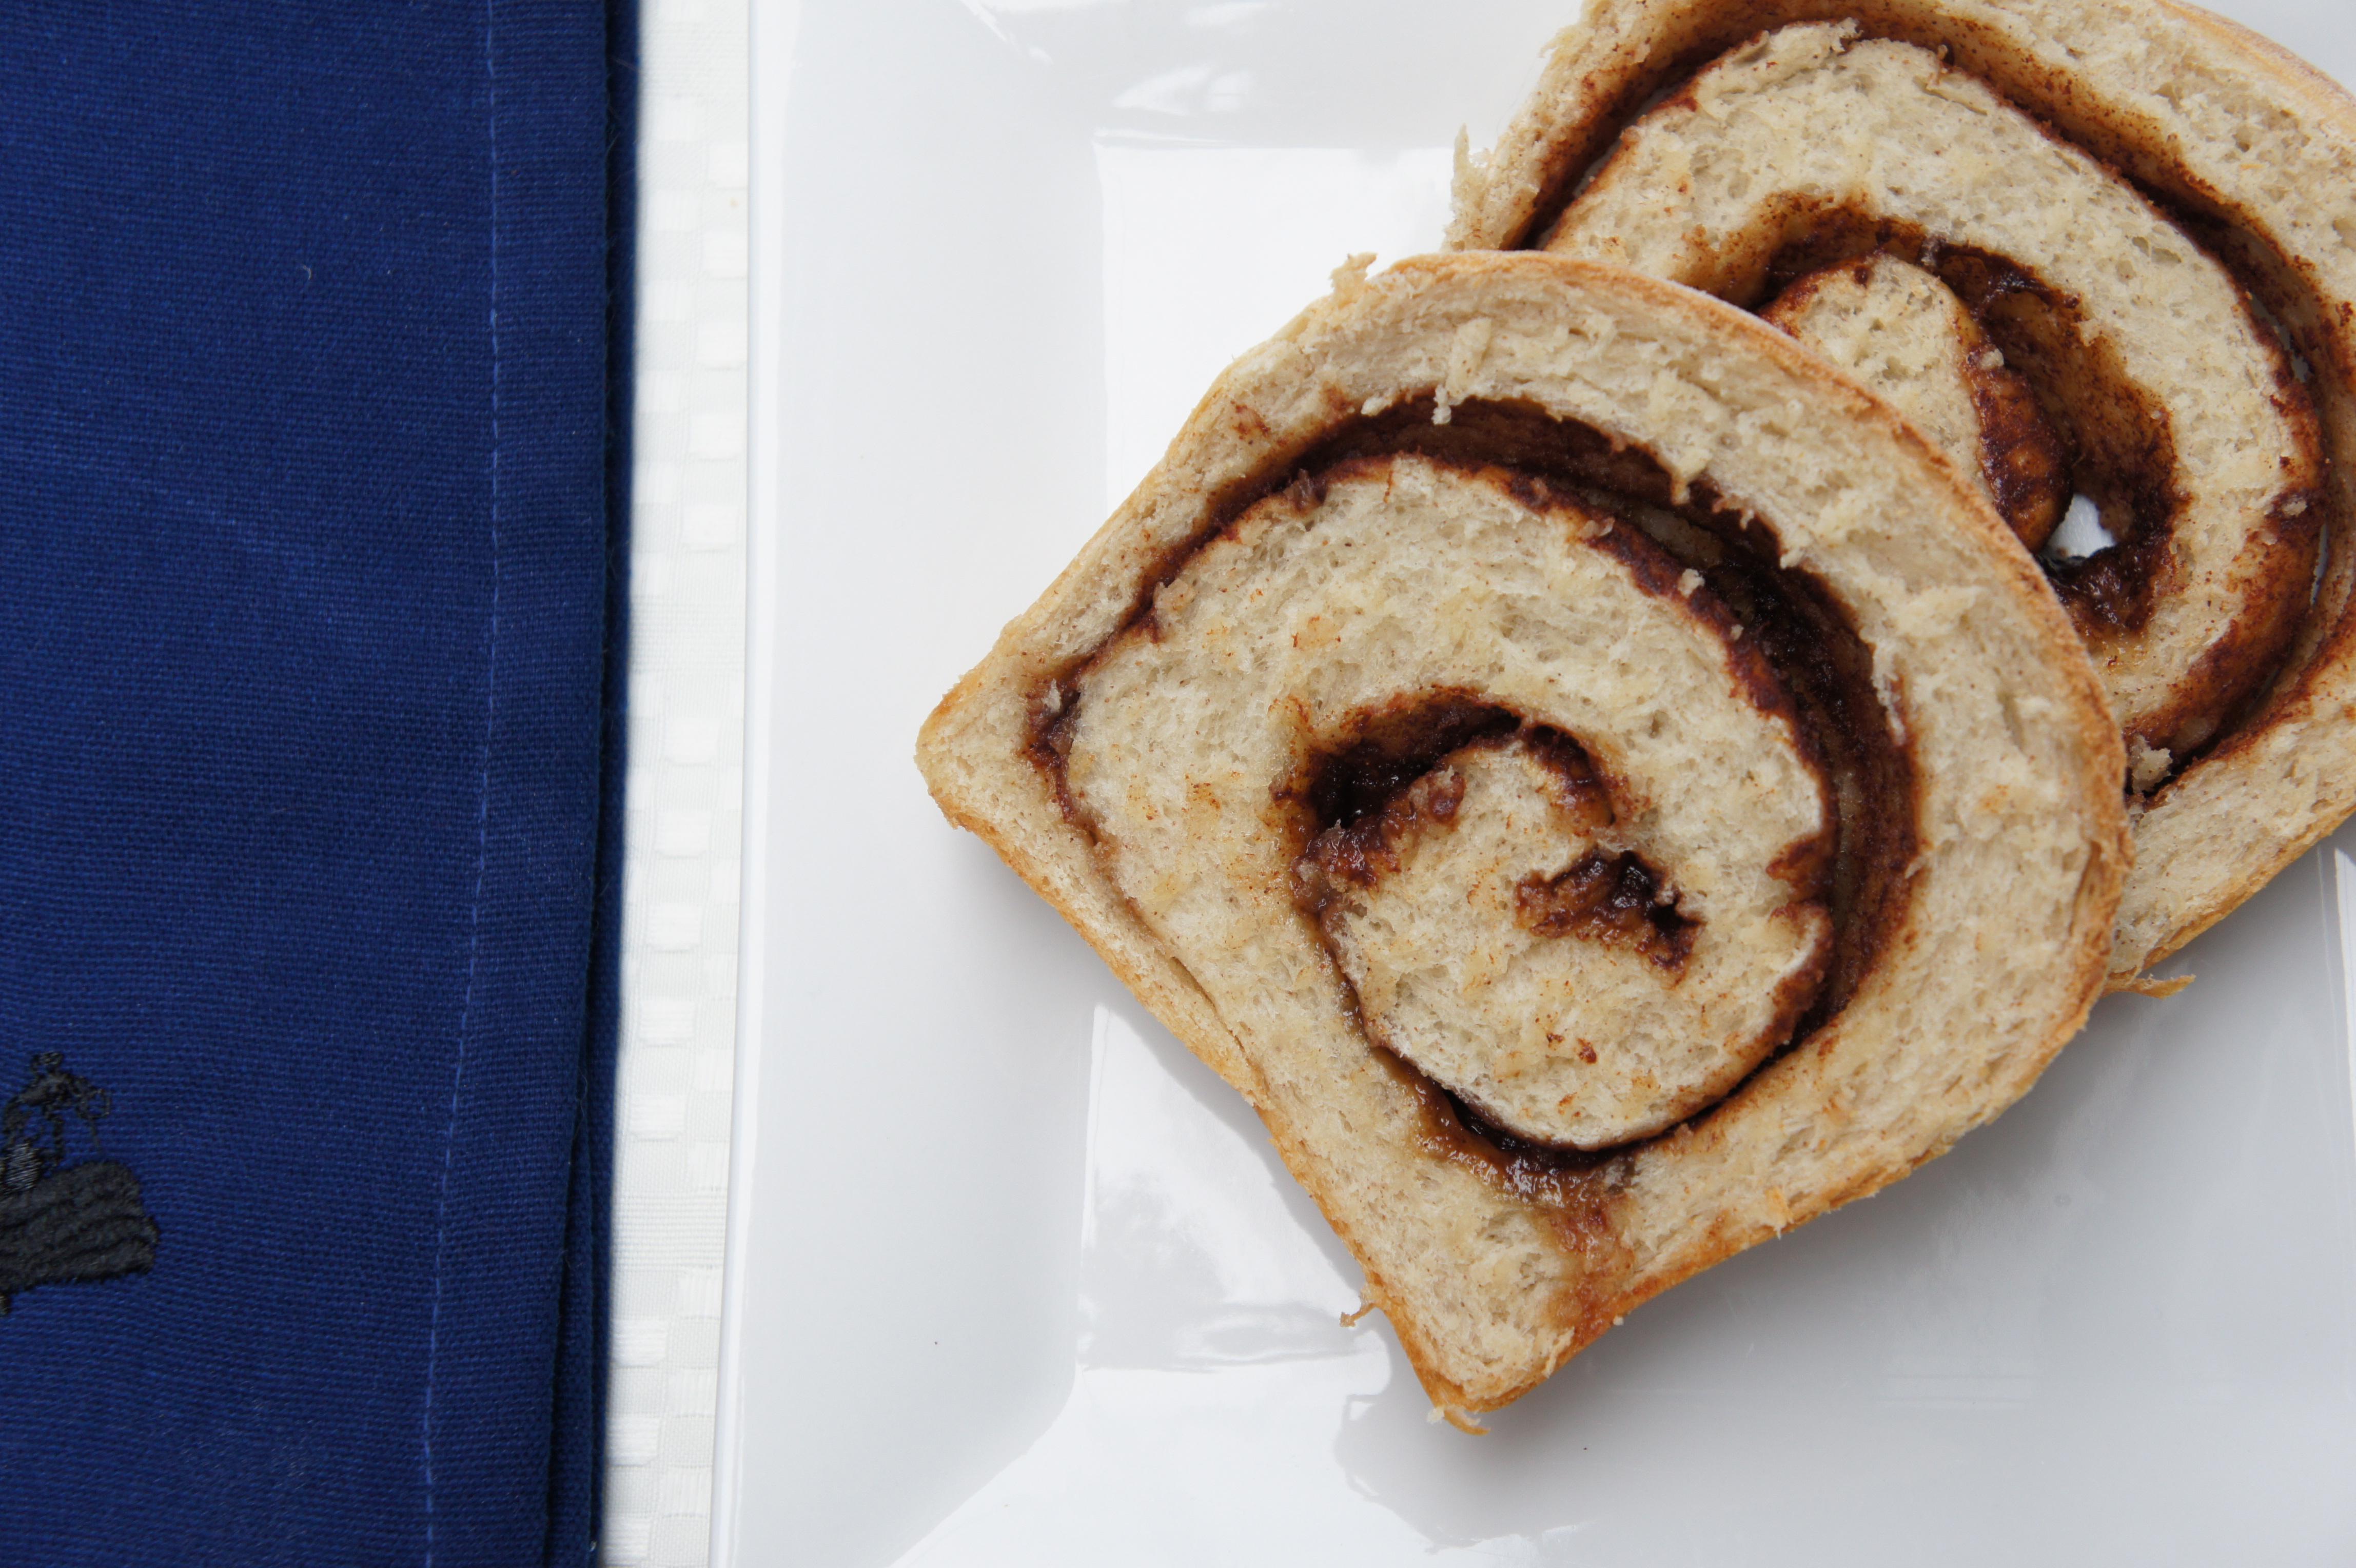 ... - Simple Food Healthy Life Home - Cinnamon Swirl Bread